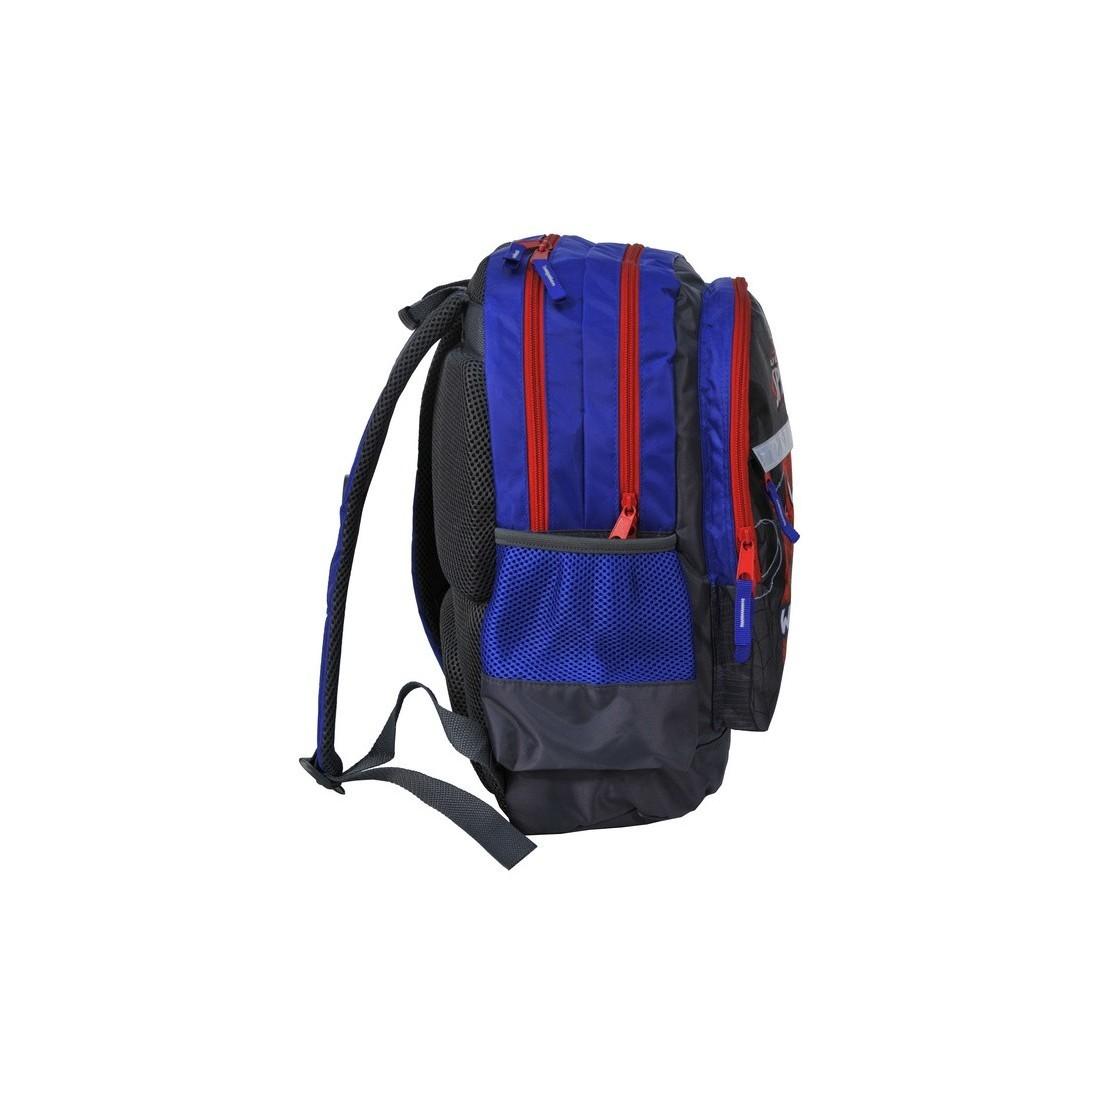 Plecak szkolny Spider-Man granatowy z odlaskami - plecak-tornister.pl